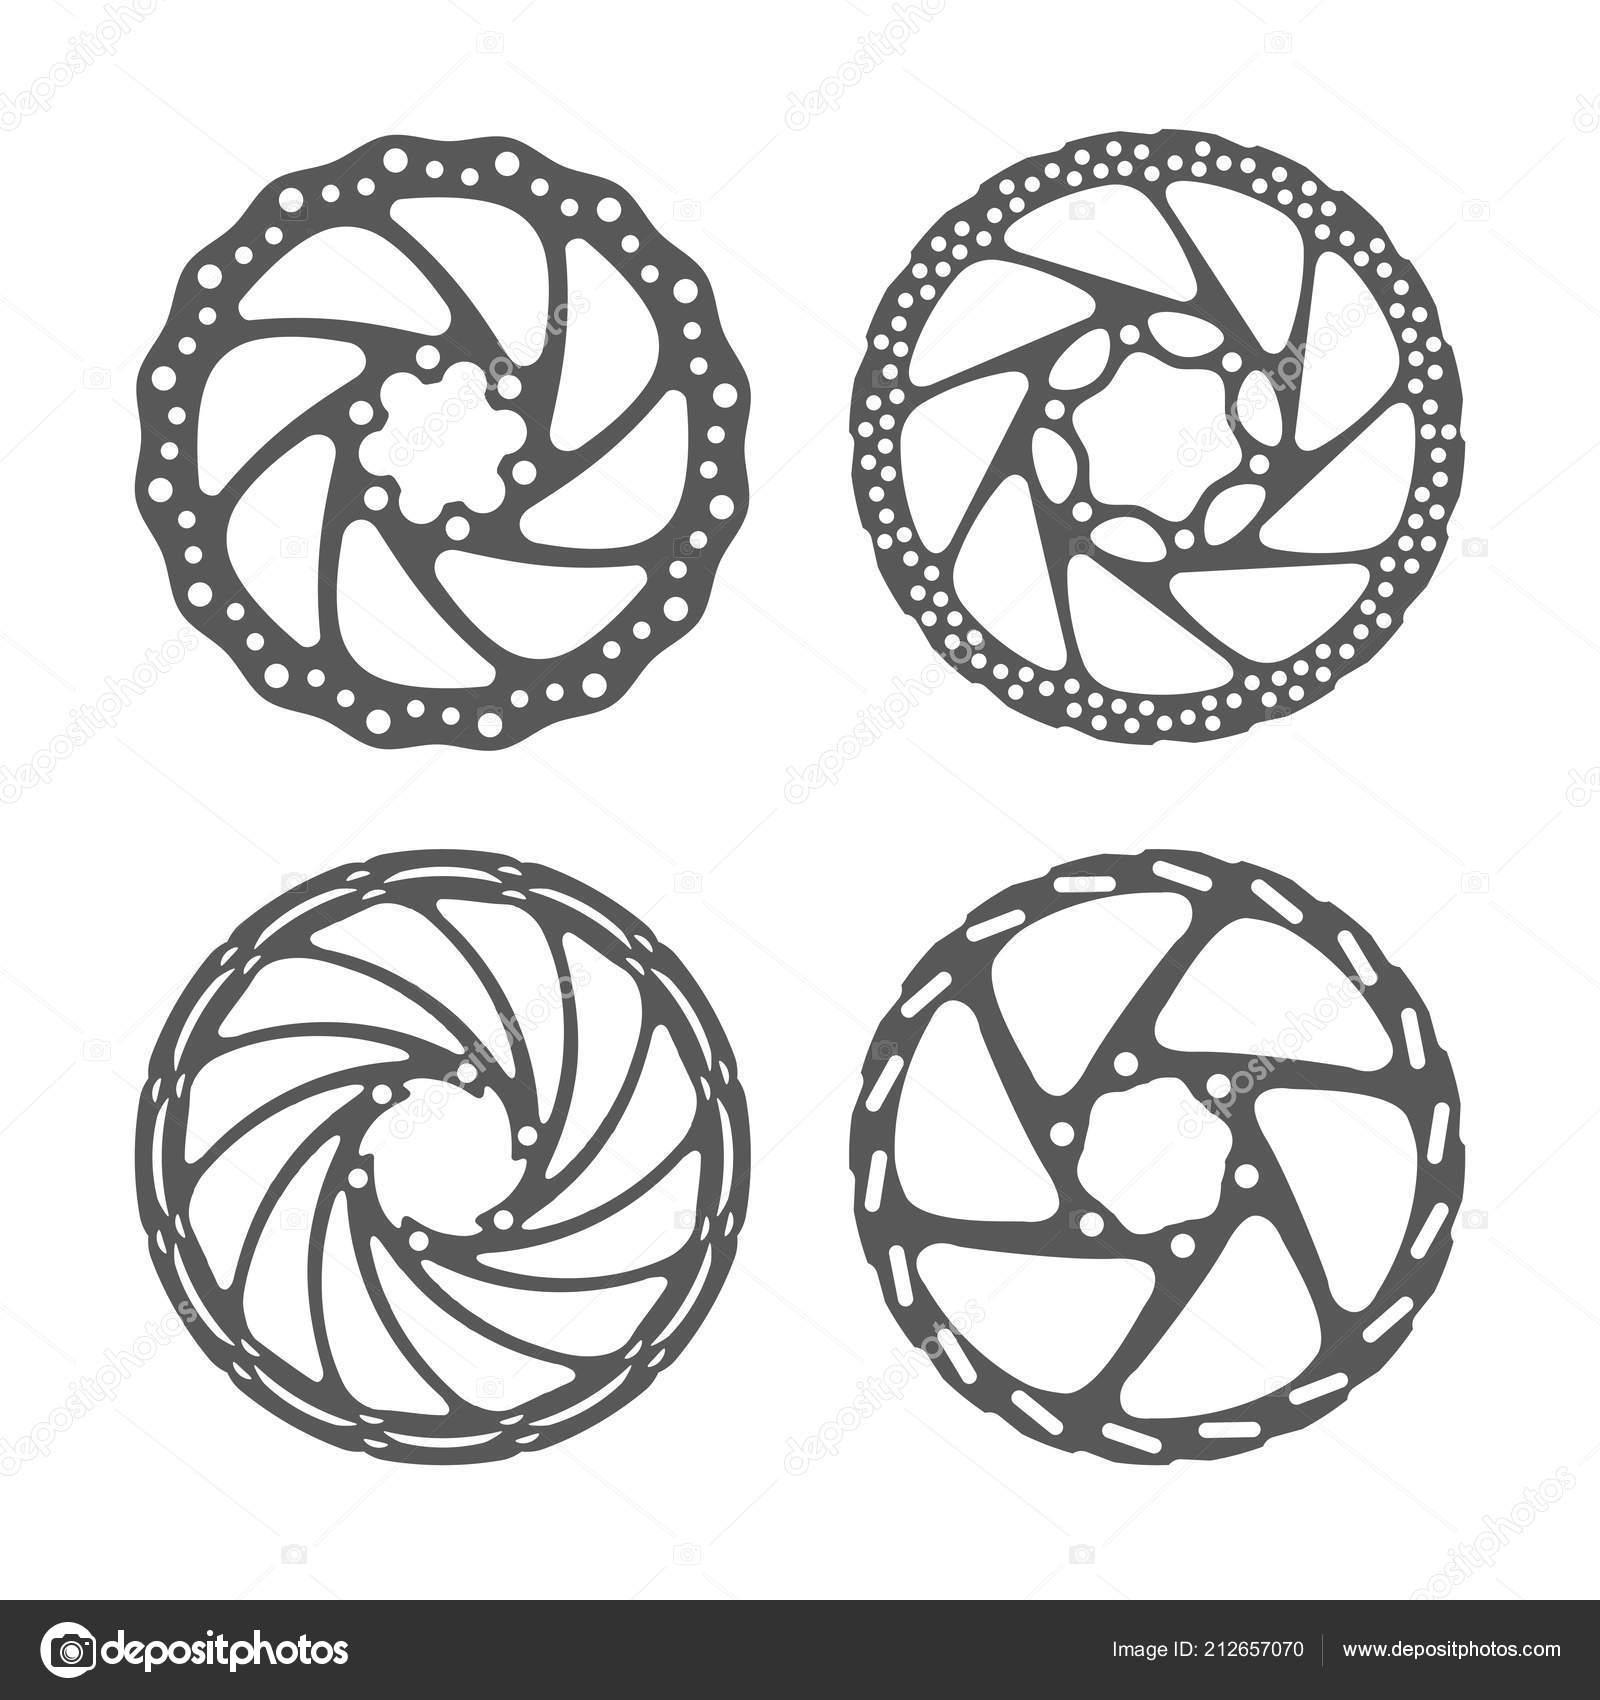 Bicycle Disc Brake Set Bike Disc Brake Rotors Different Shapes